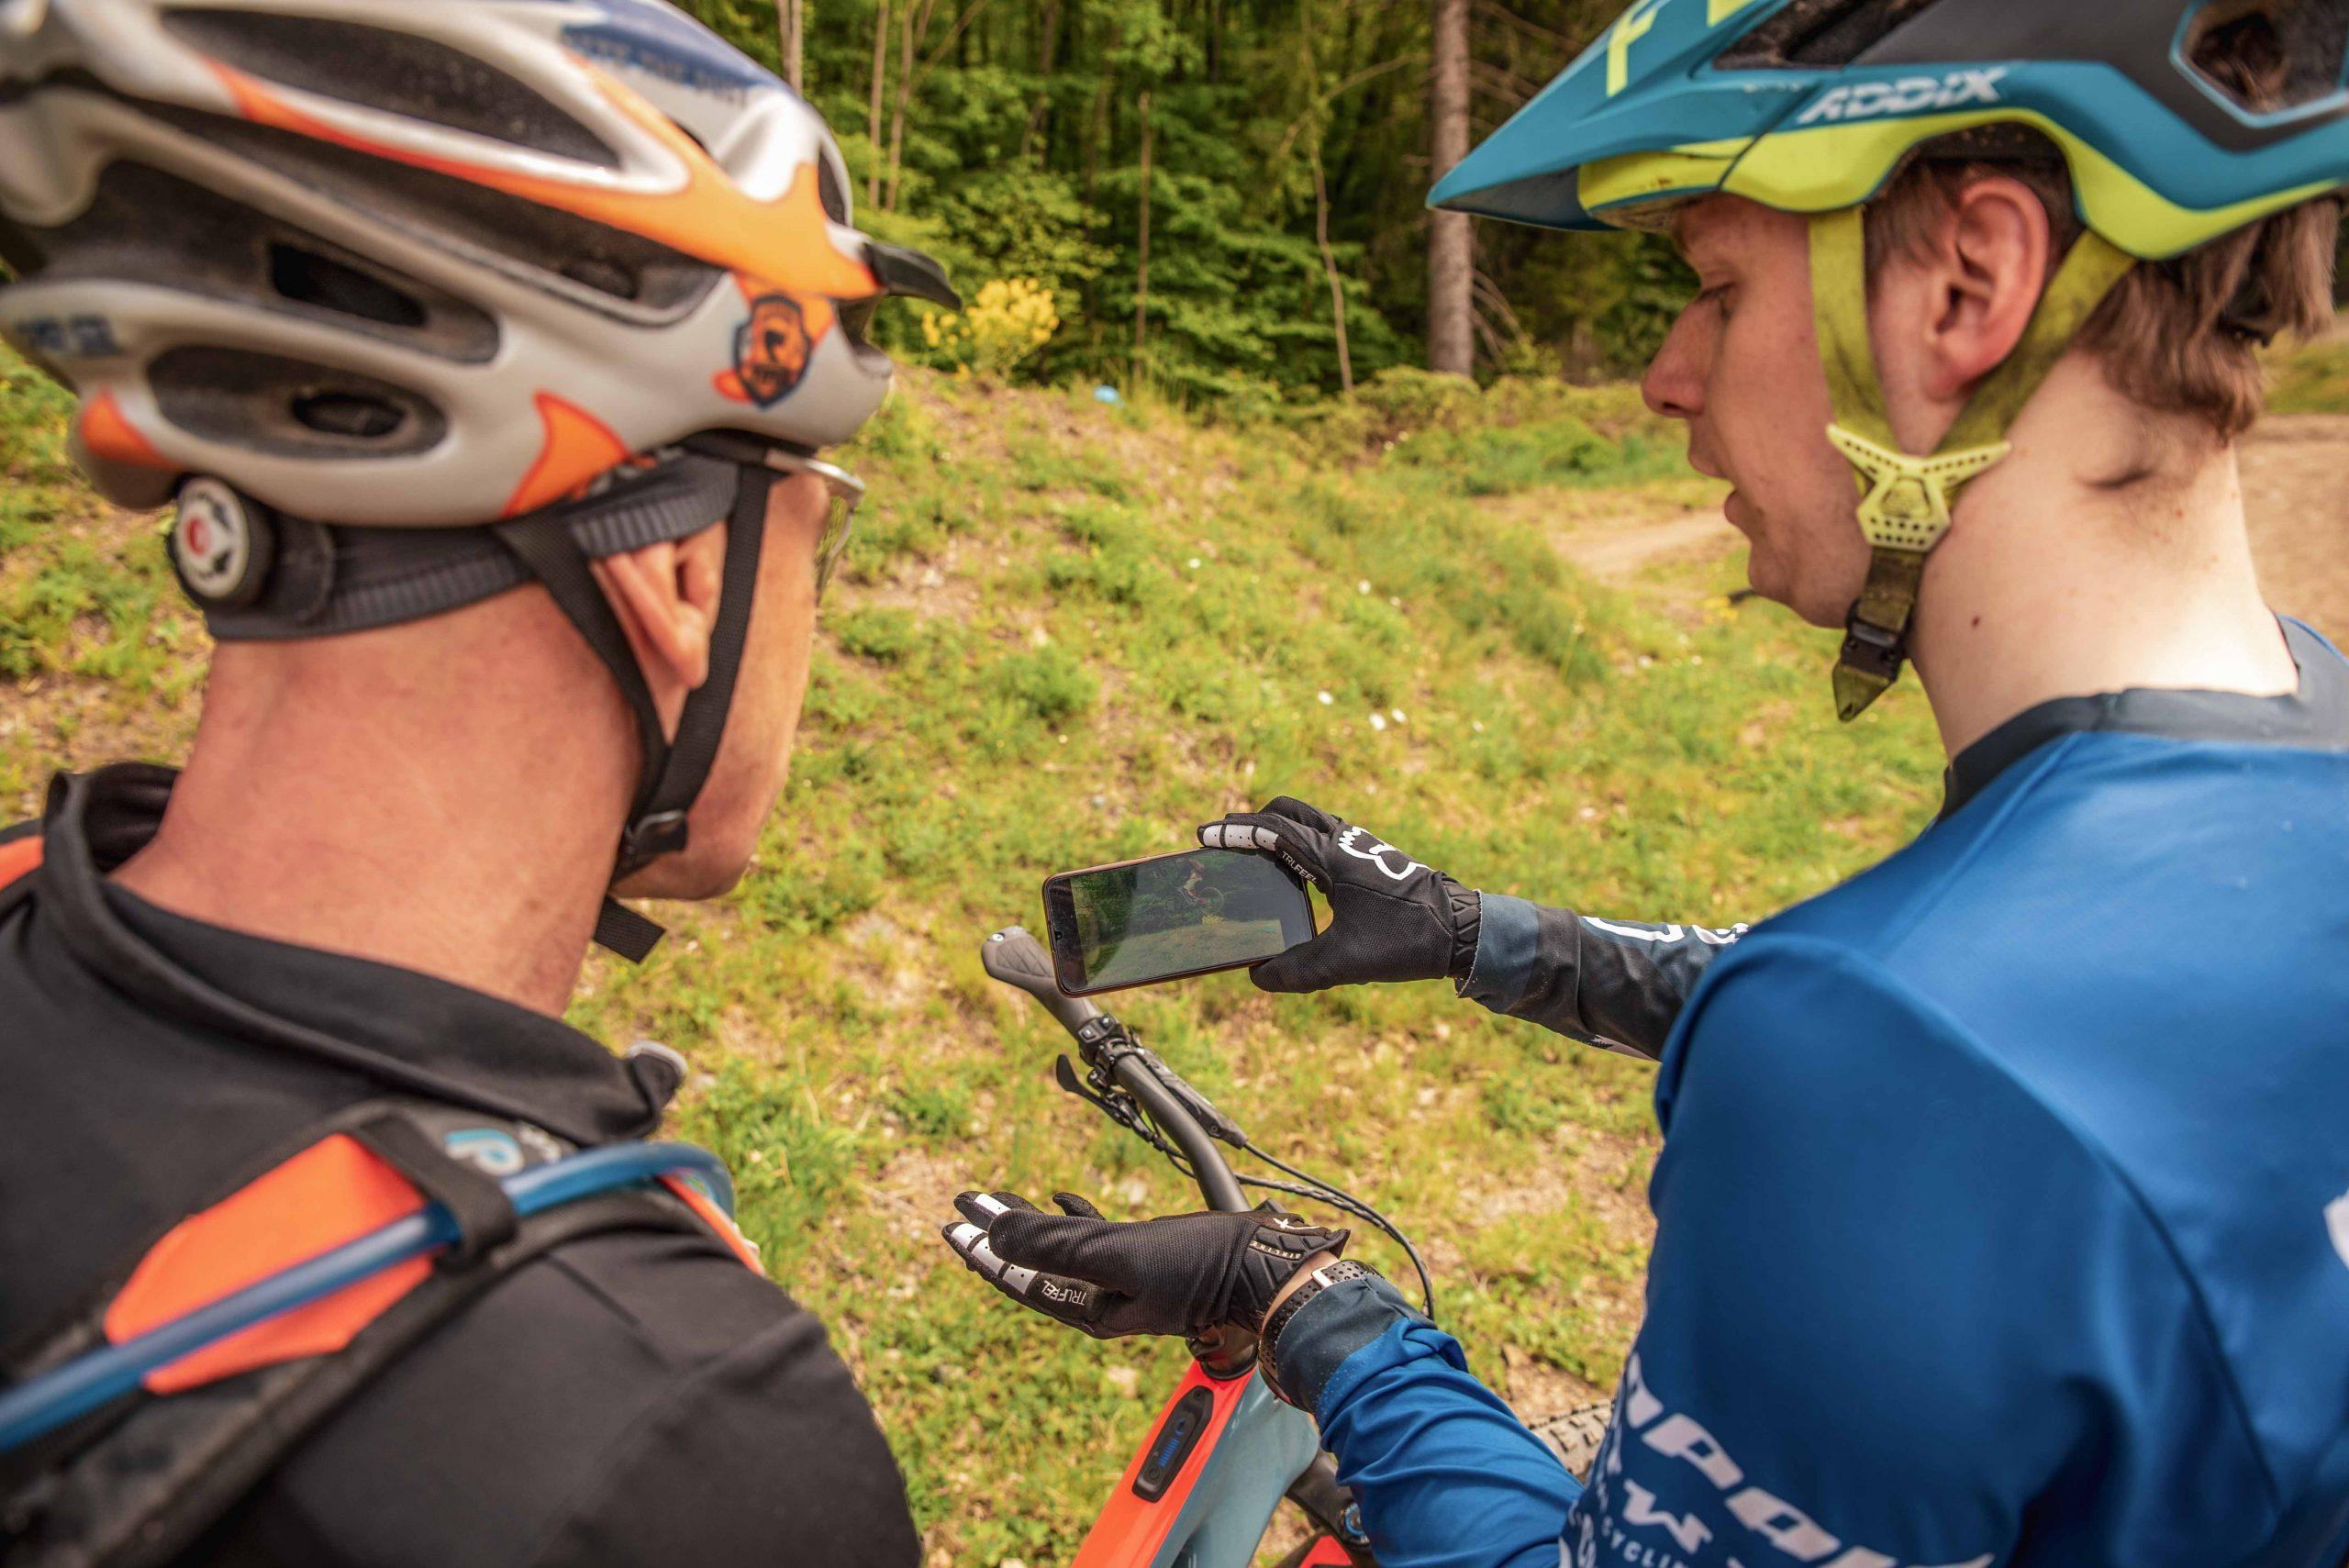 Bikepark Privatkurs Fahrtechnik - MTB - eBike - eMTB - Rock my Trail Bikeschule - Training - Kurs